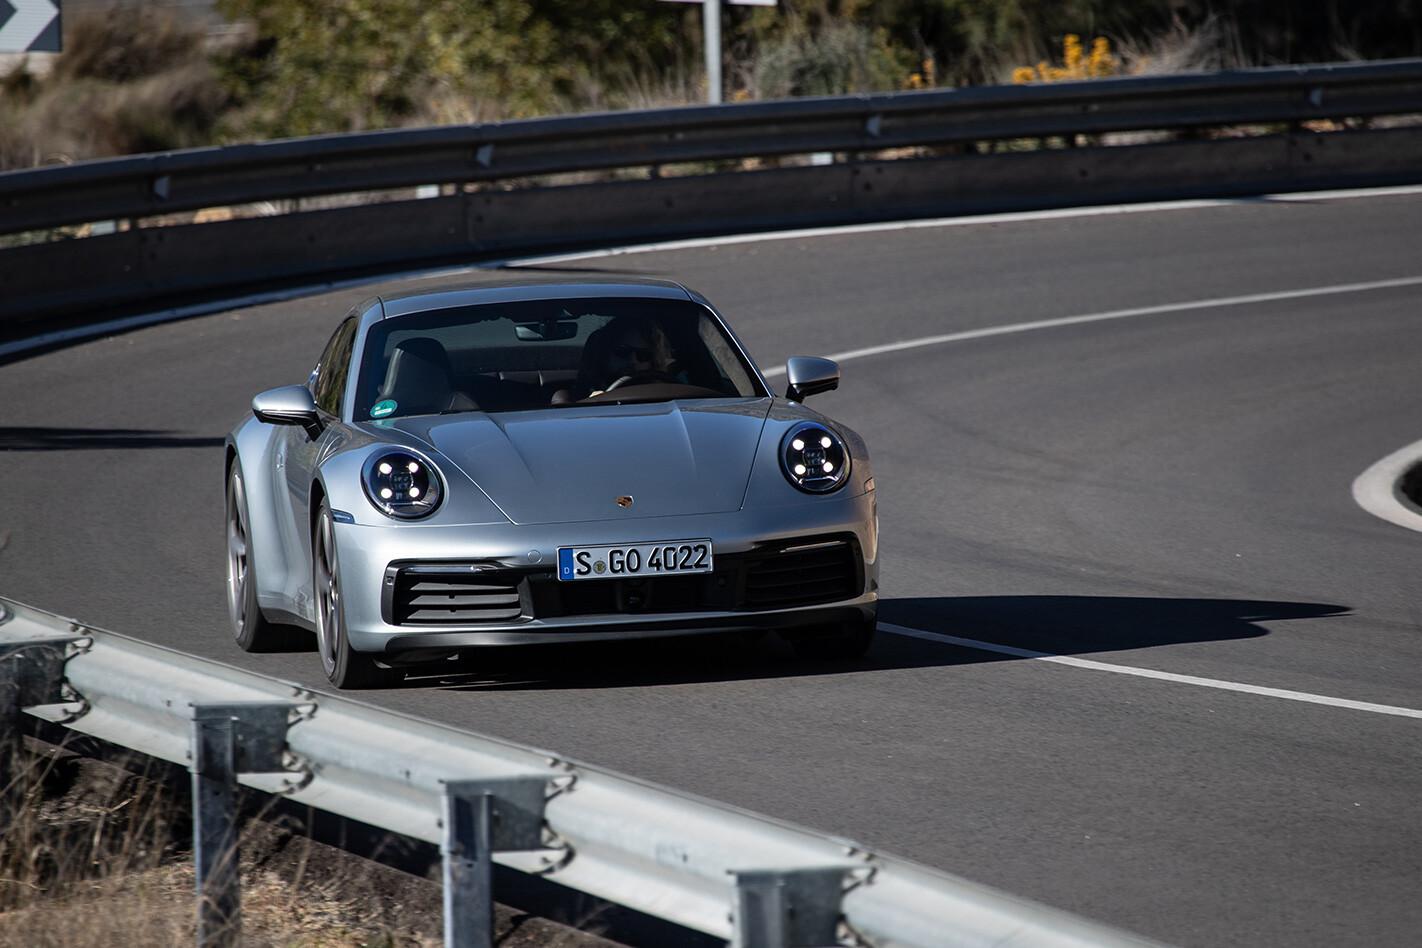 Porsche 911 Carrera S Cnr Jpg